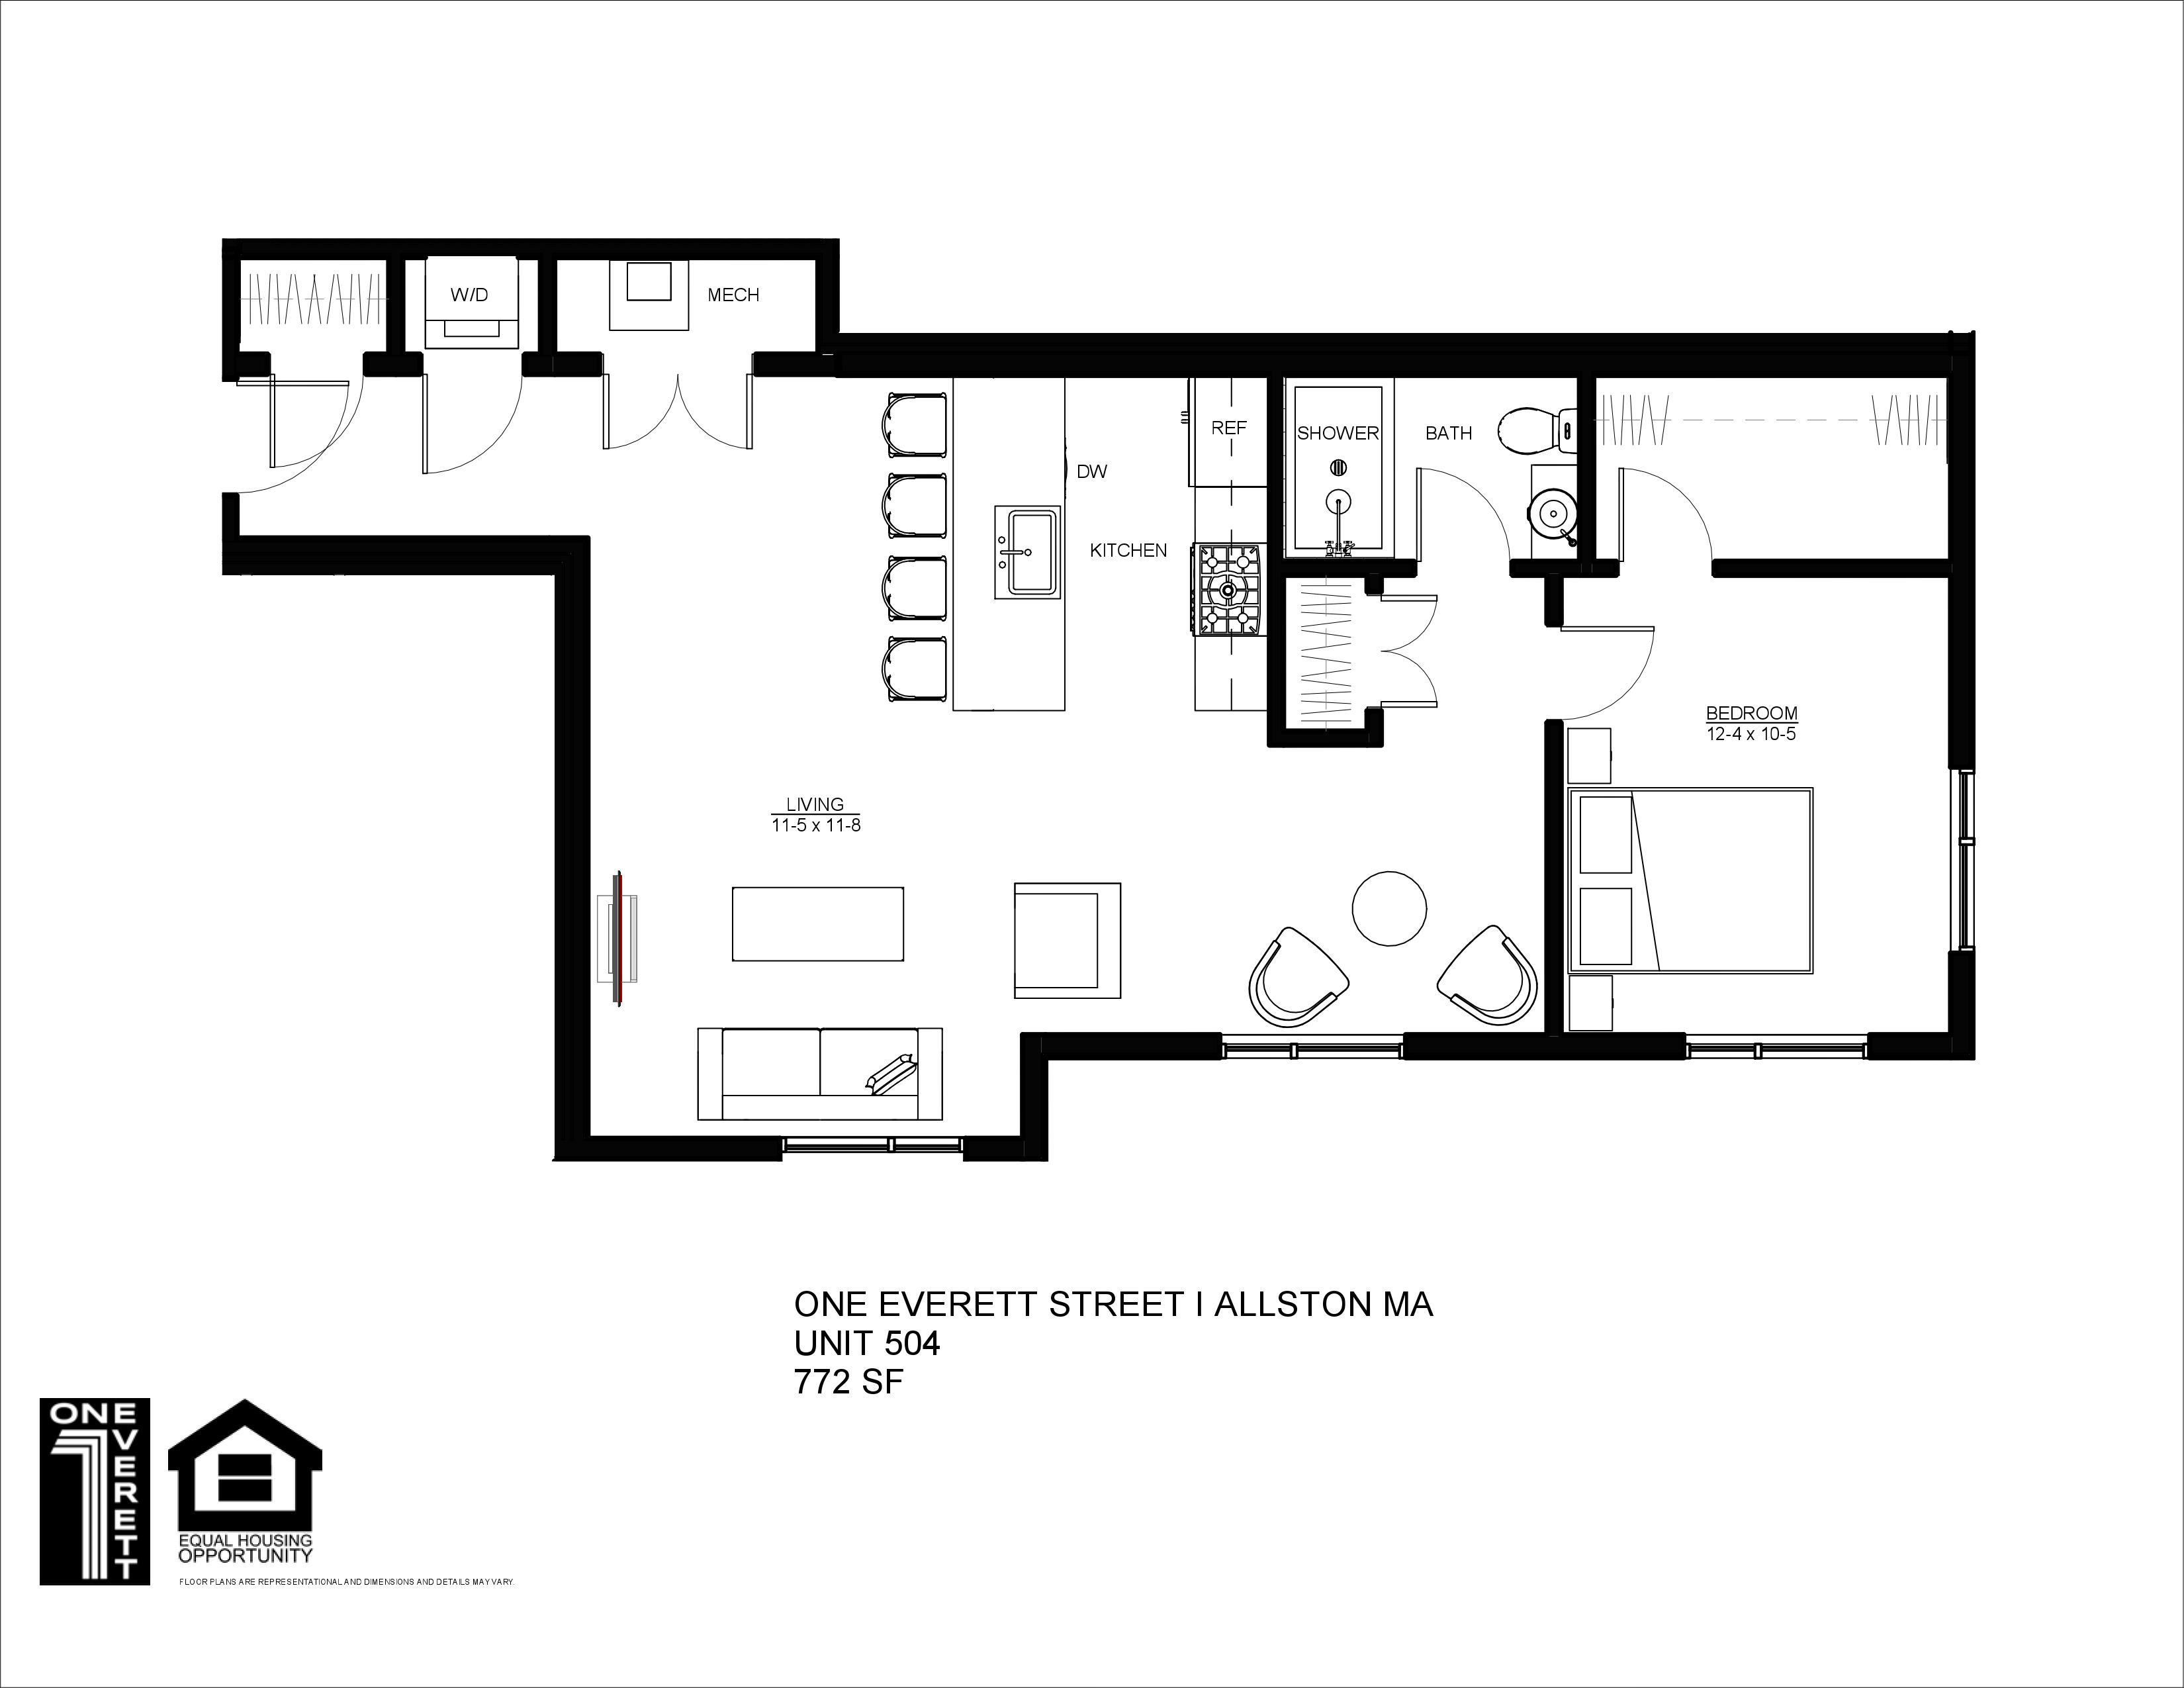 One Everett Allston Floor Plan